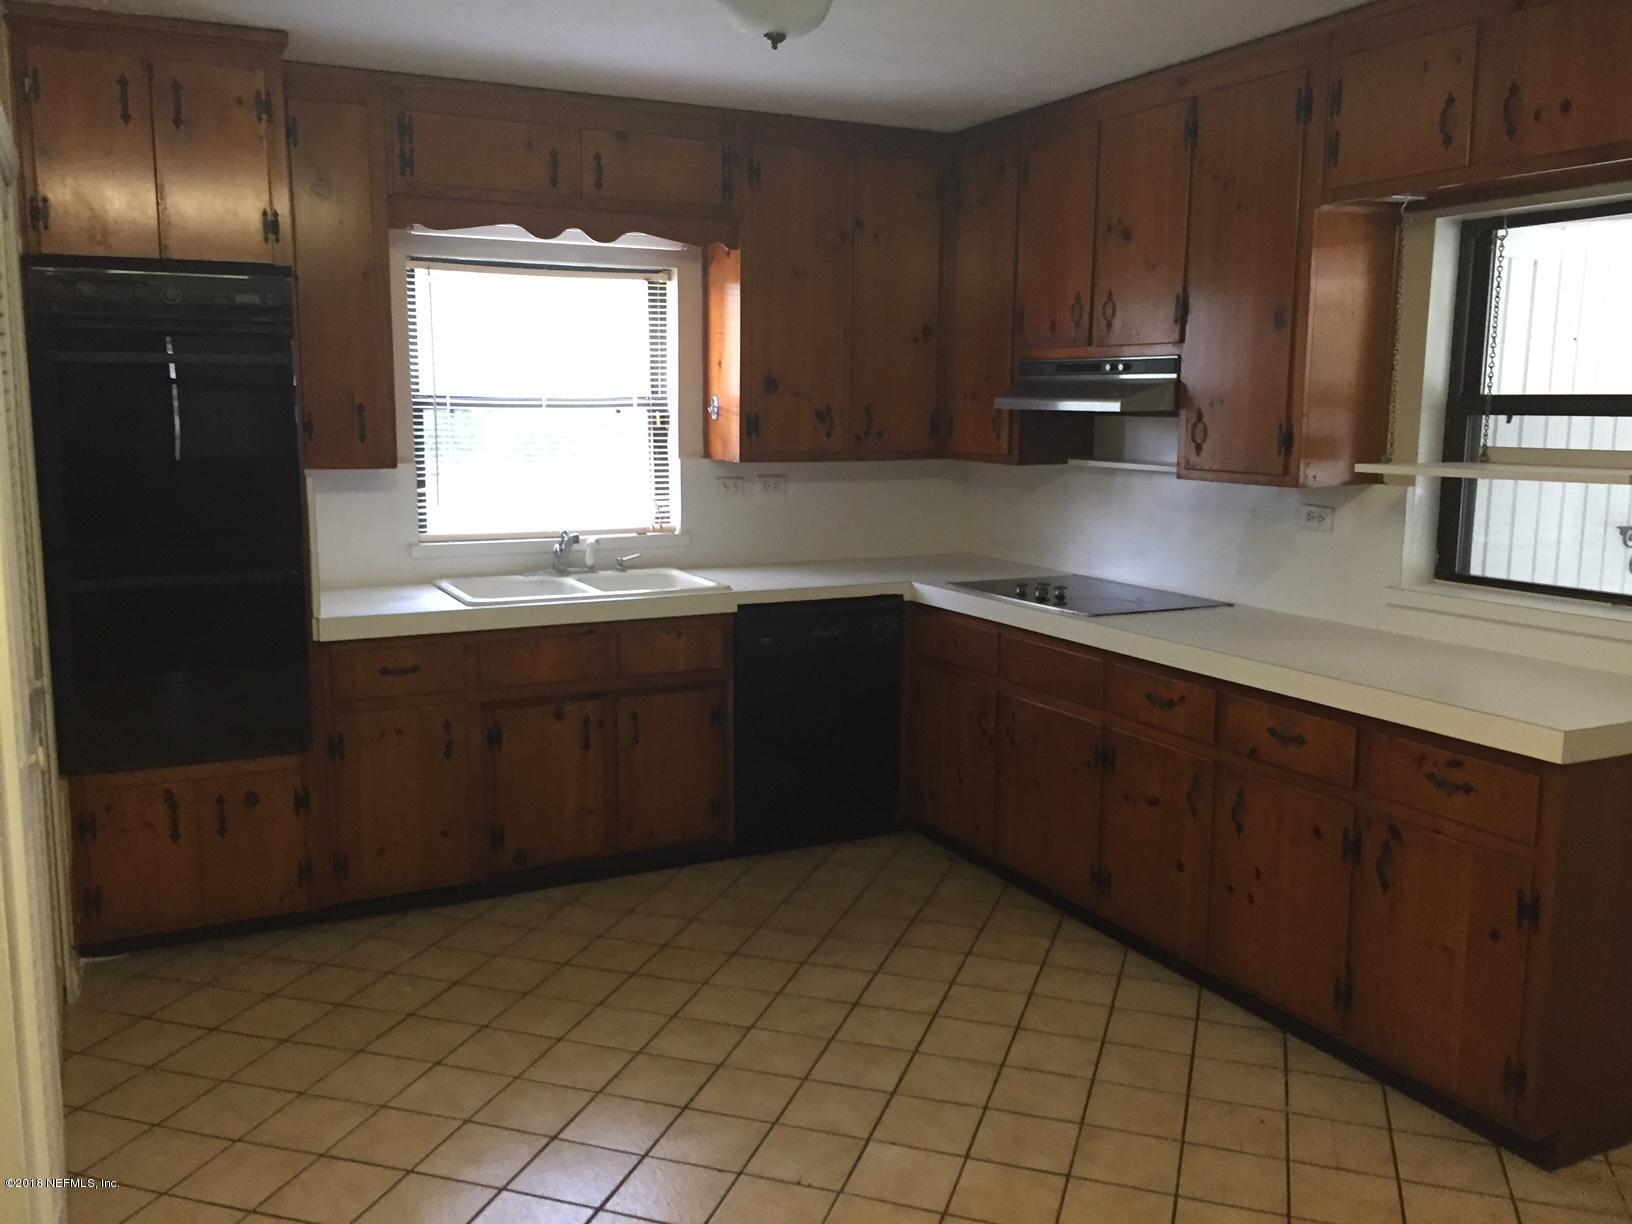 3580 NEW BERLIN, JACKSONVILLE, FLORIDA 32226, 4 Bedrooms Bedrooms, ,2 BathroomsBathrooms,Residential - single family,For sale,NEW BERLIN,946493